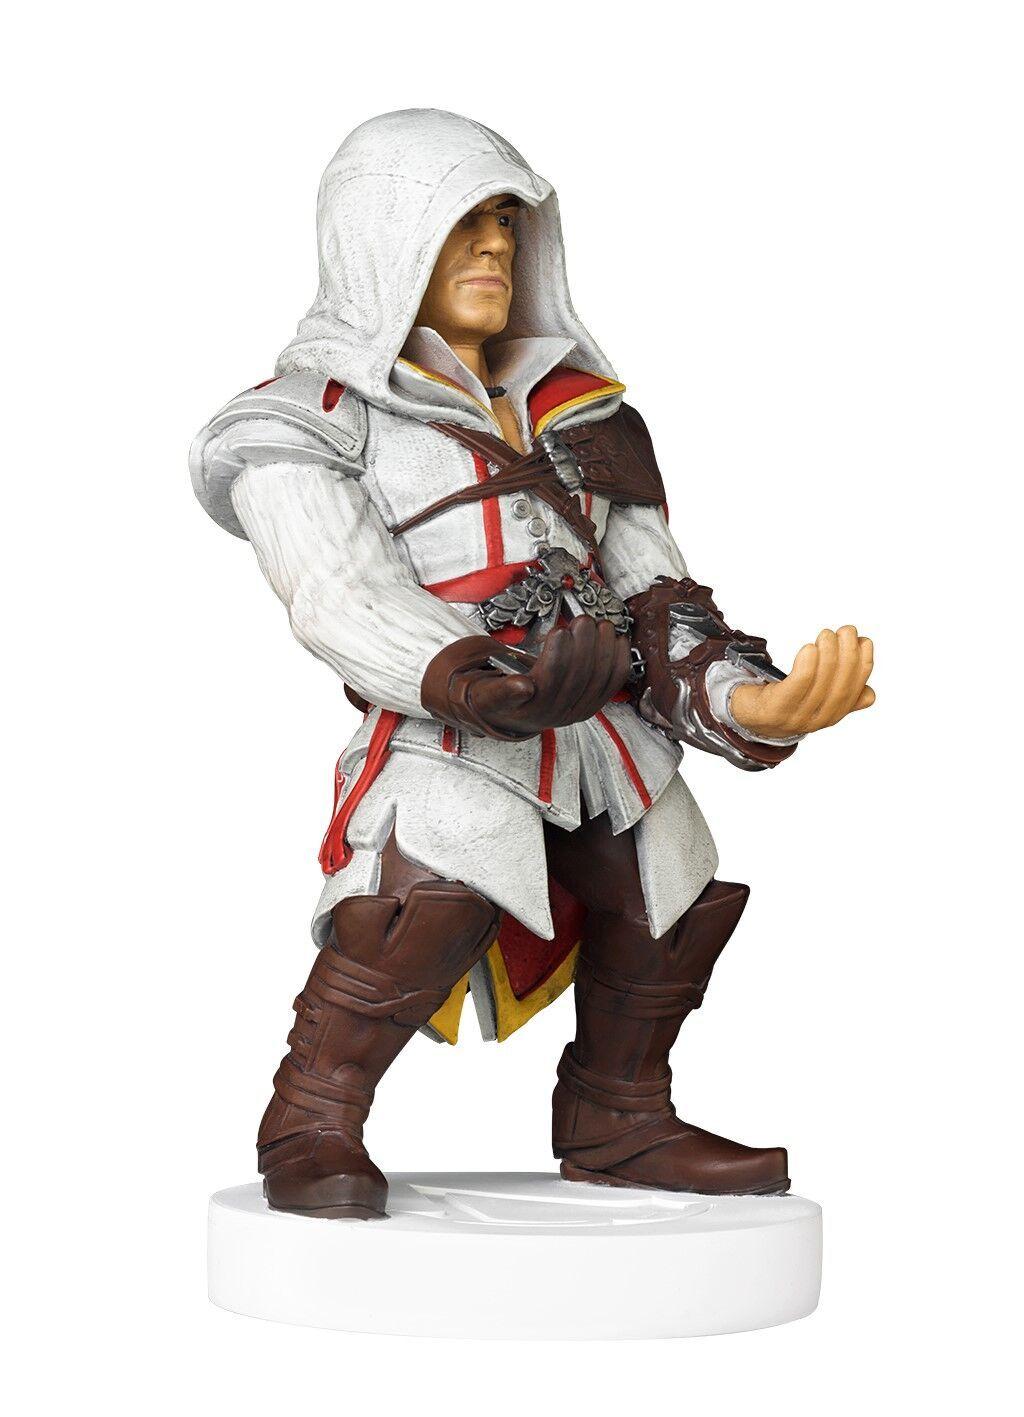 Cable Guy Controller Holder - Ezio screenshot